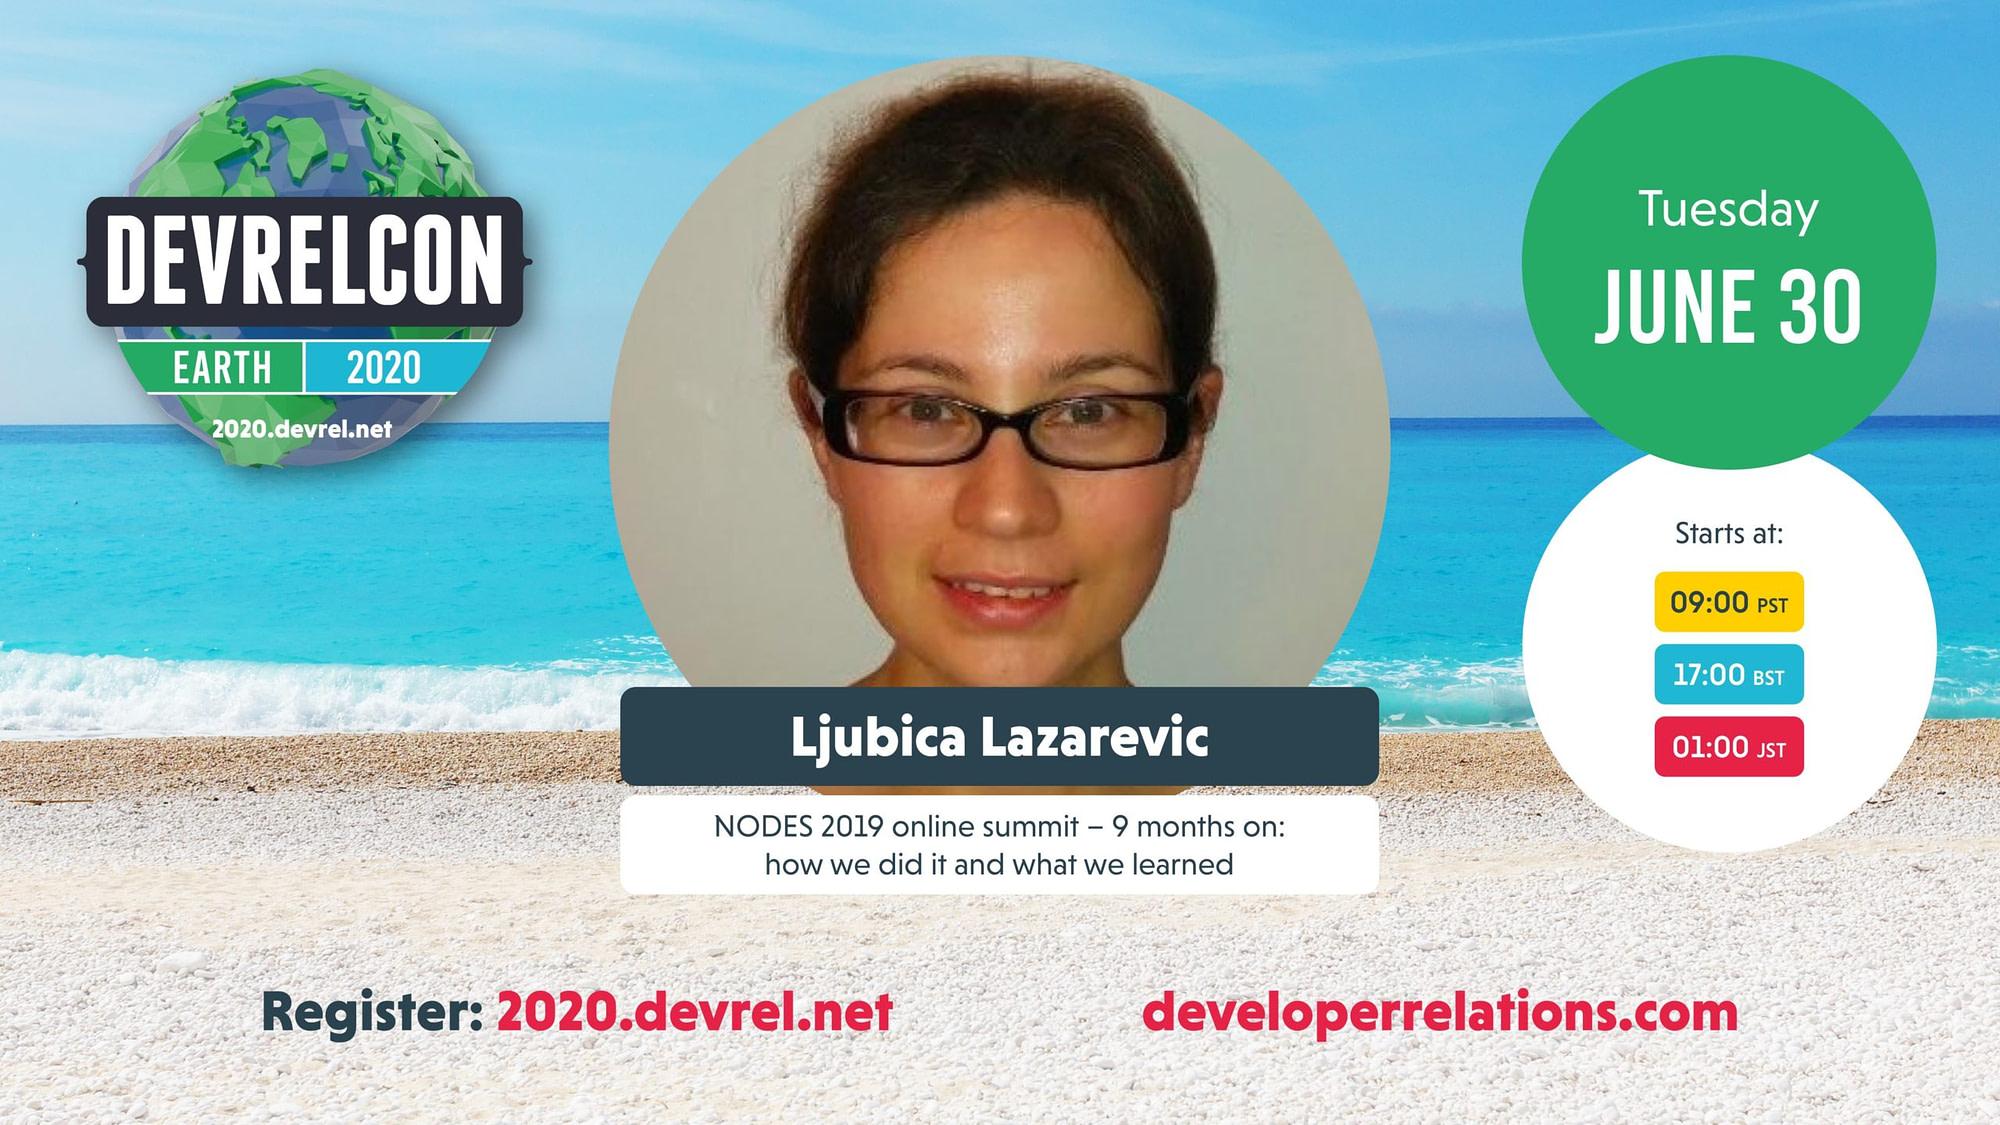 Ljubica Lazarevic speaking at DevRelCon Earth 2020